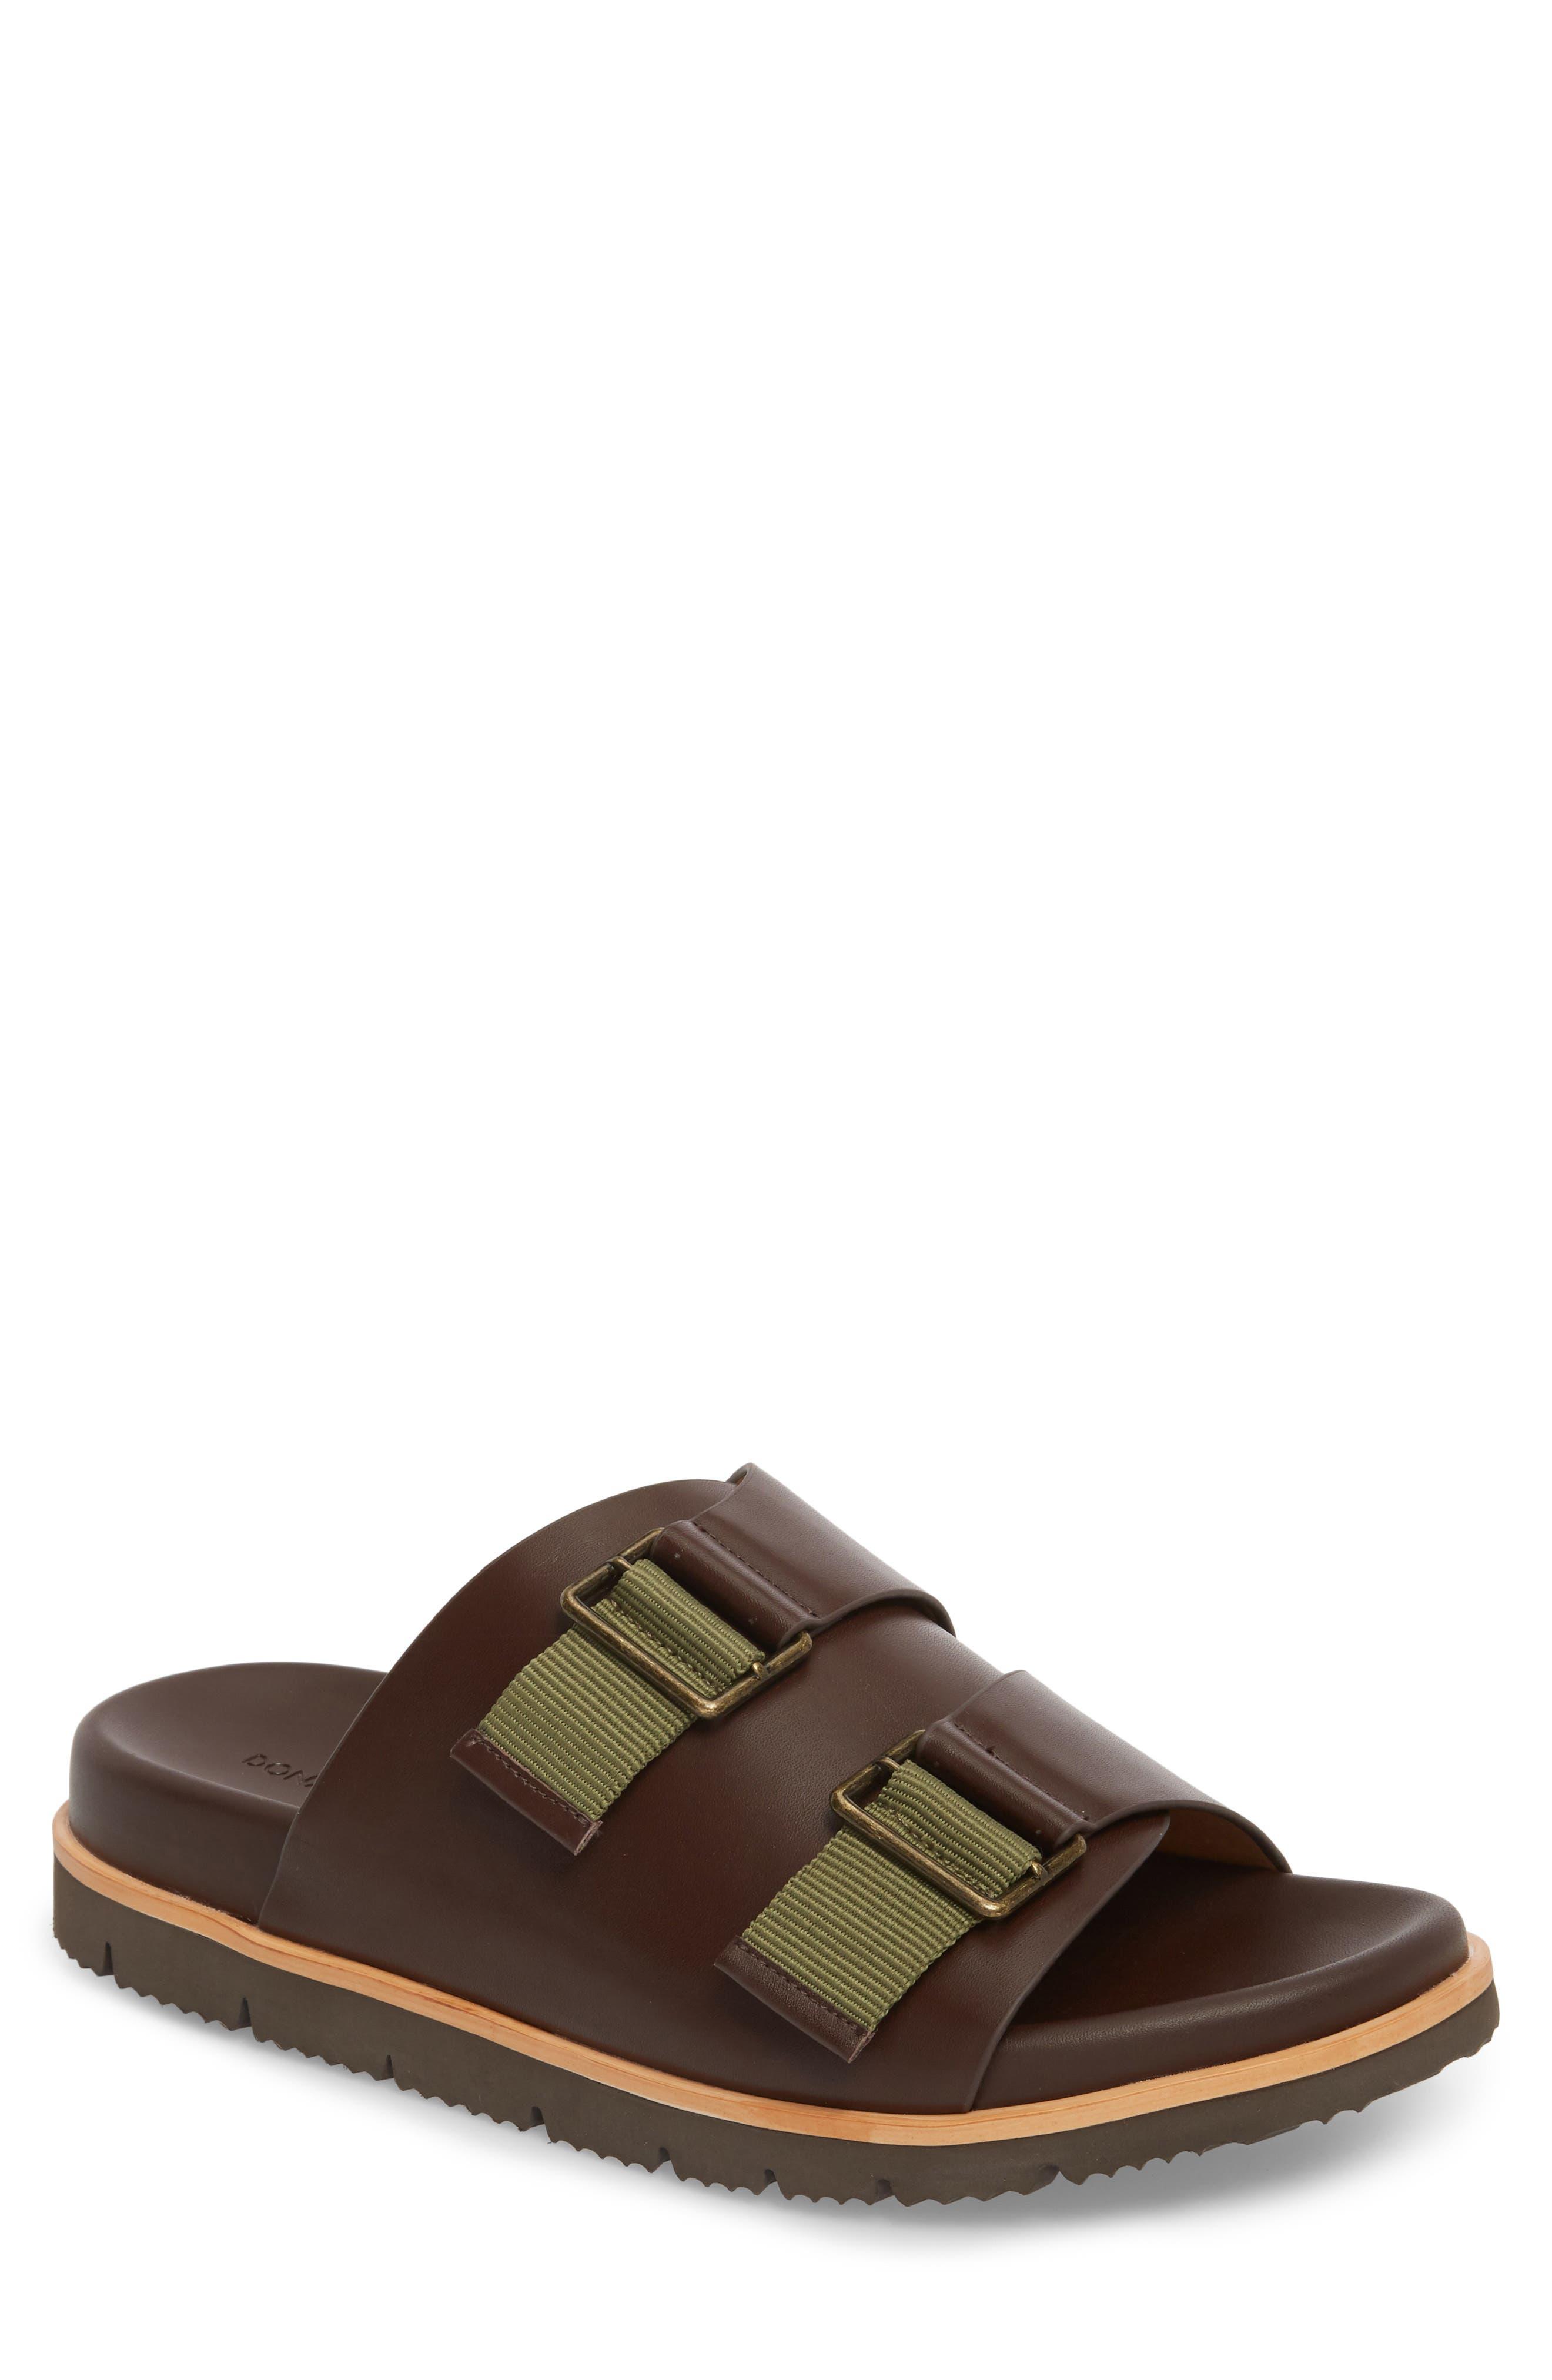 Donald Pliner Slide Sandal (Men)